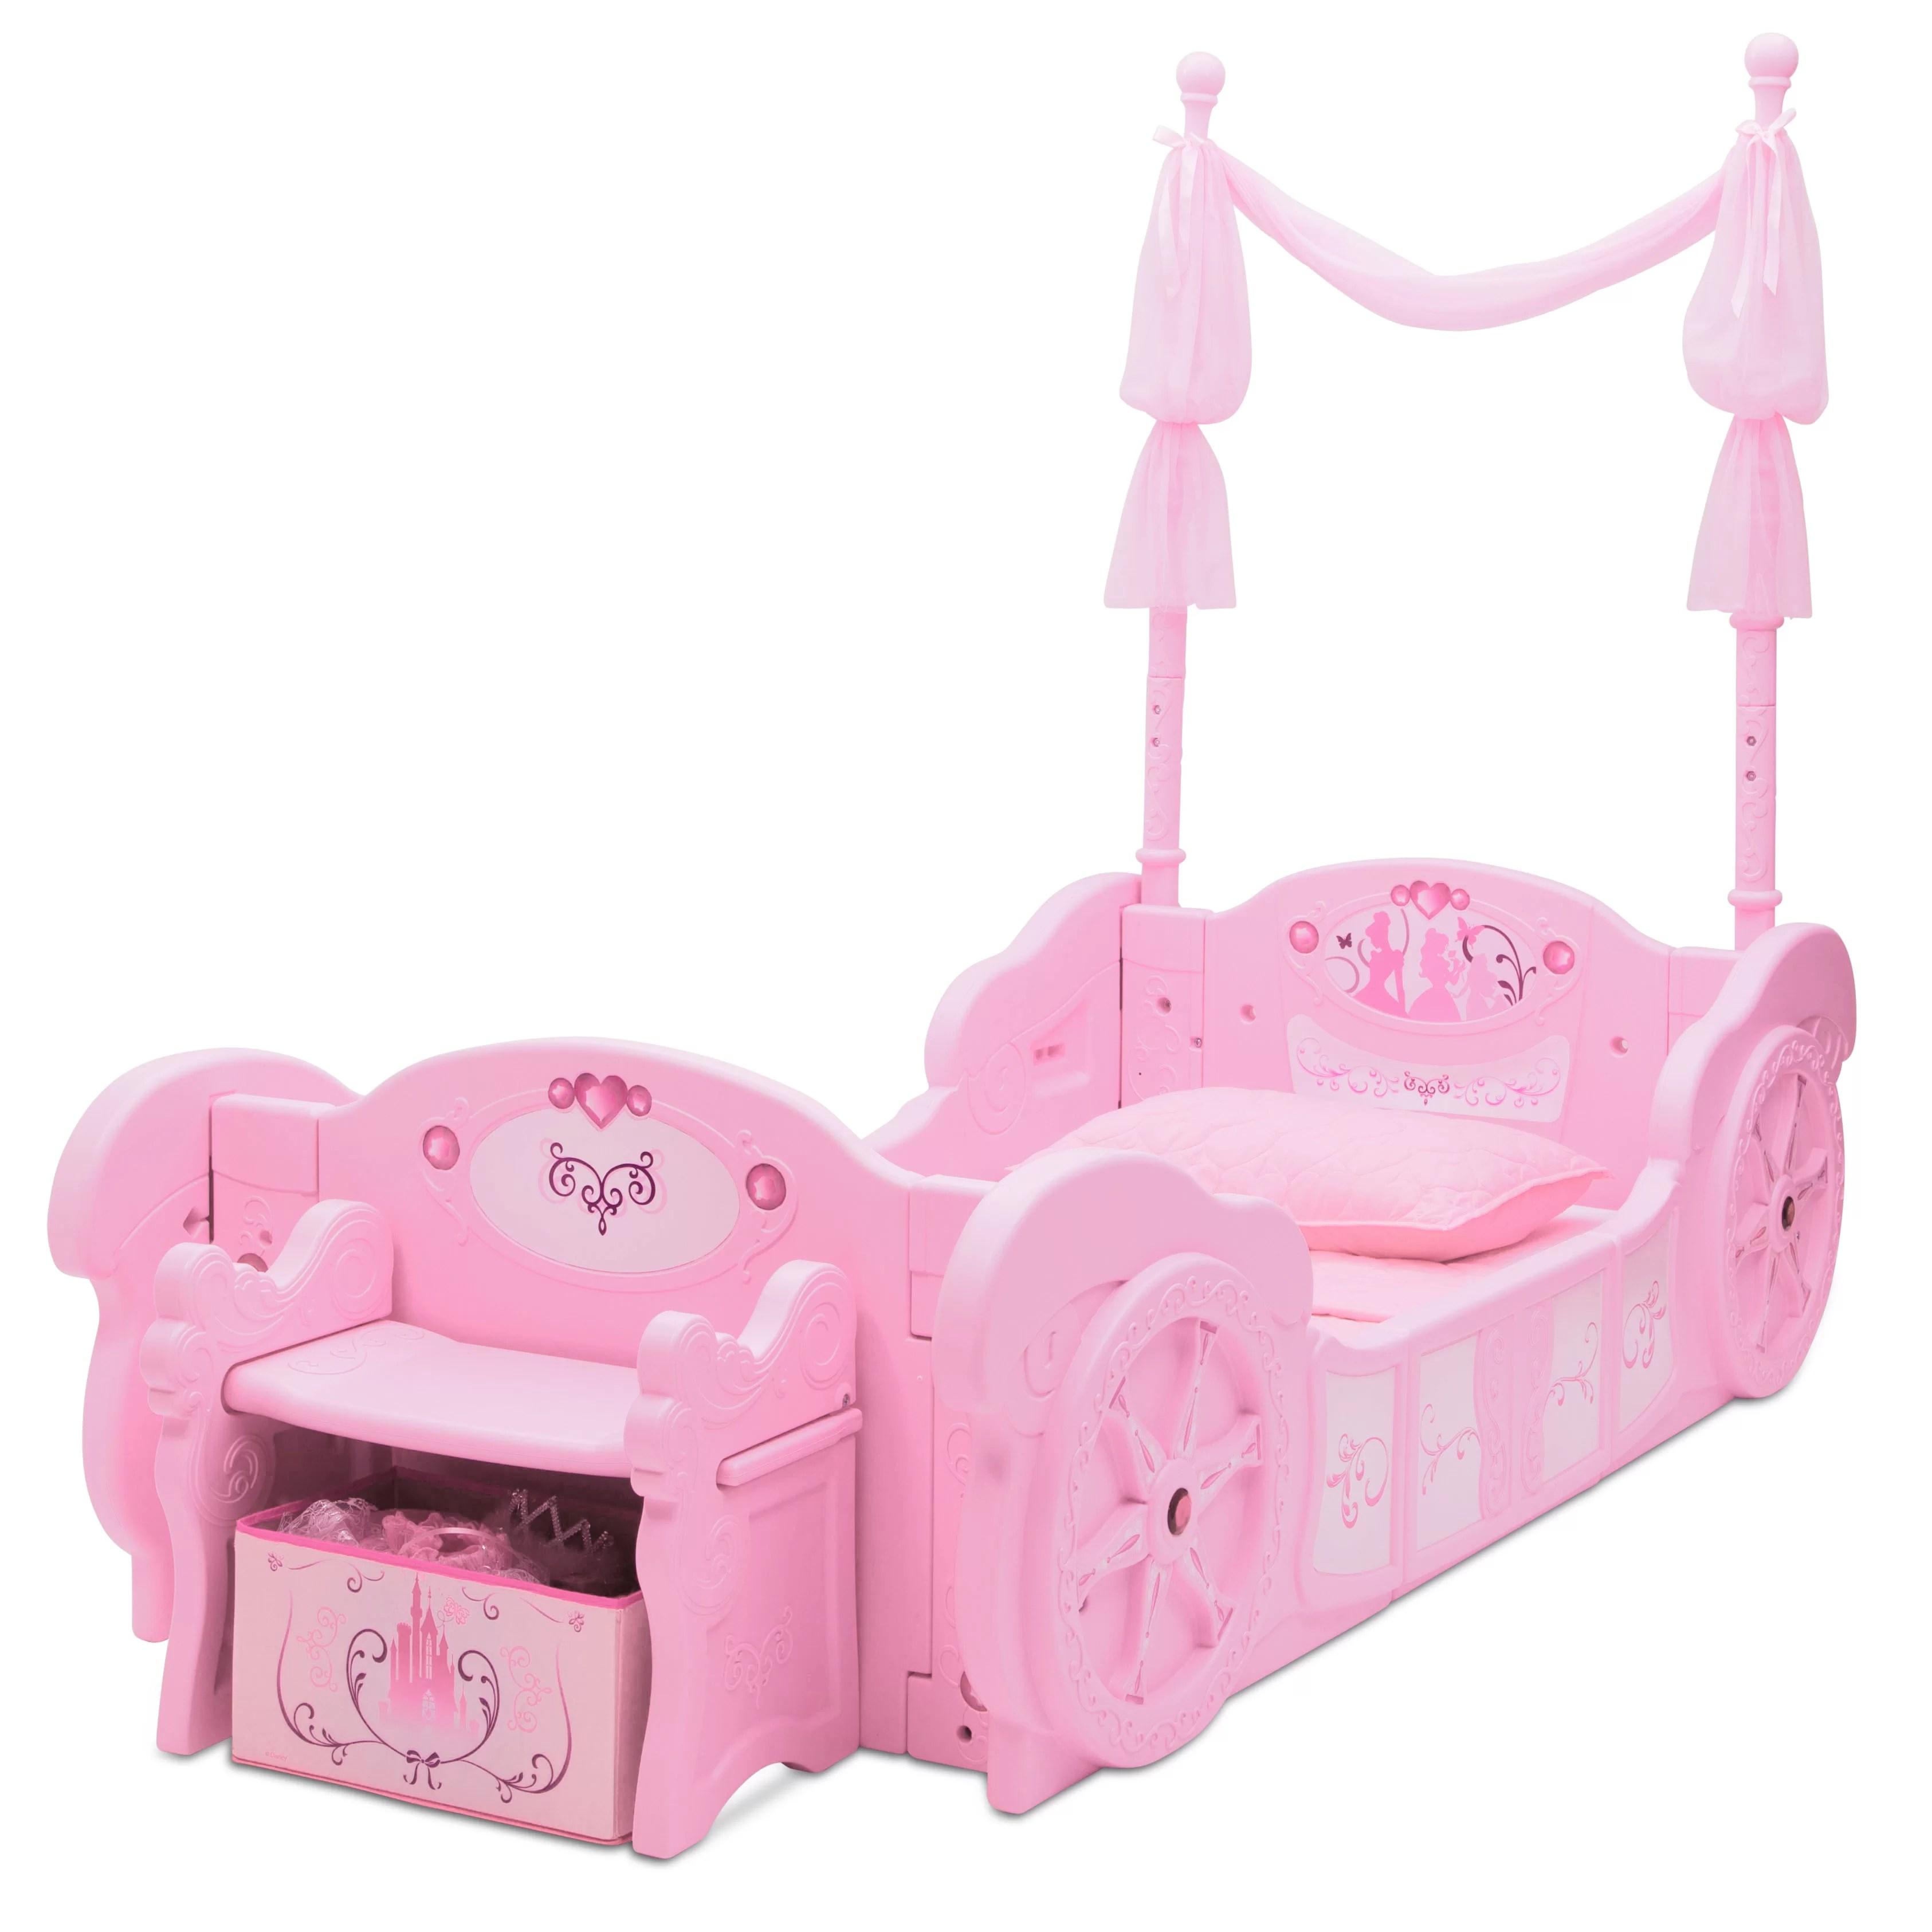 Delta Children Disney Princess Carriage Convertible Toddler Bed Reviews